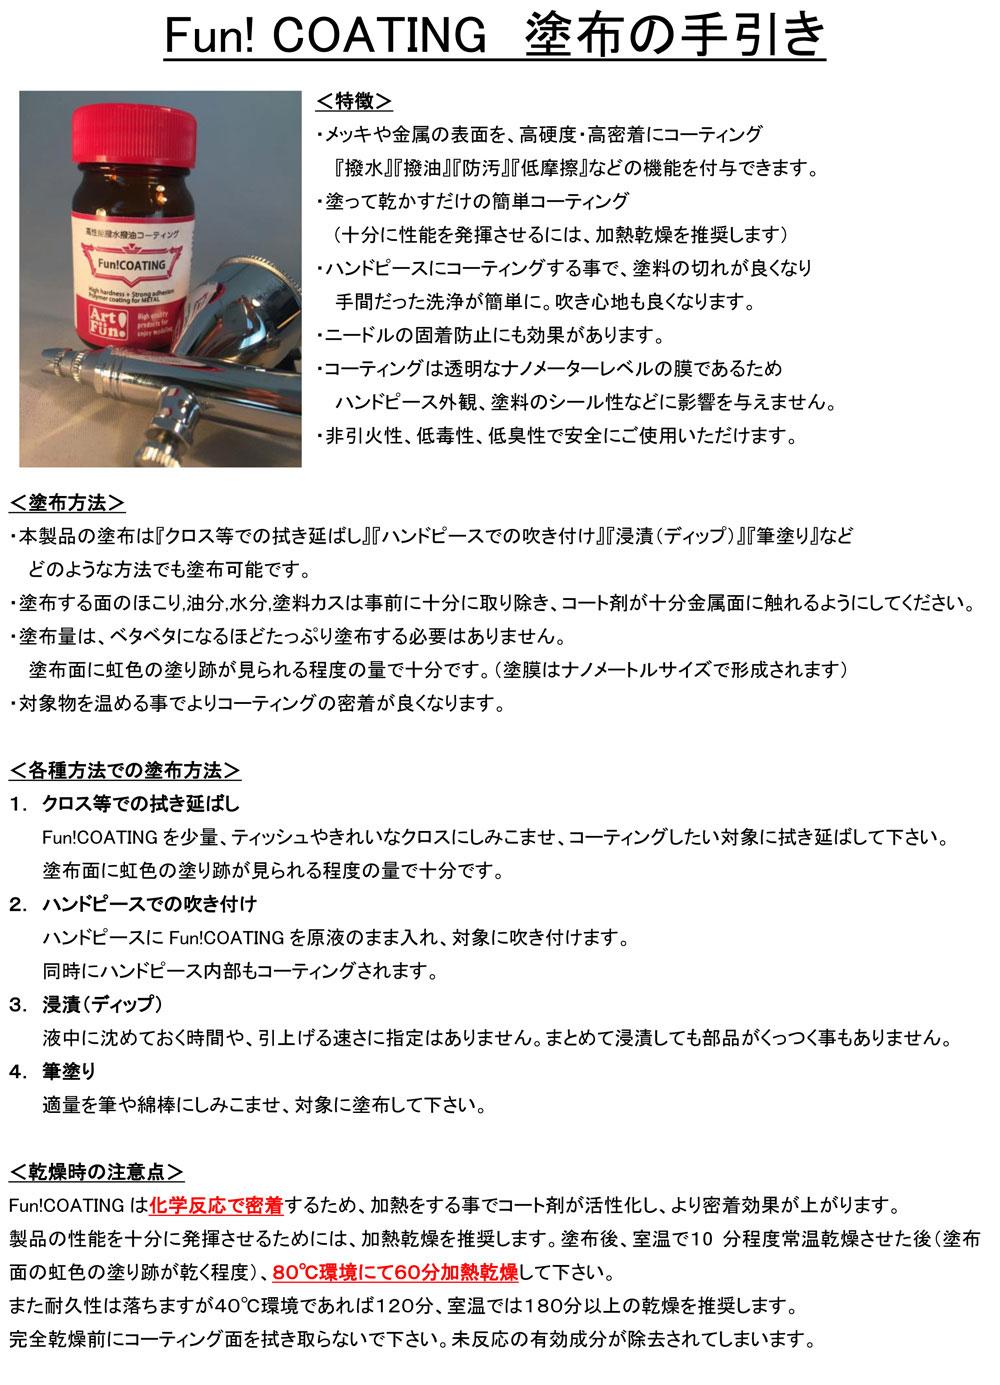 Fun! COATING (高性能撥水撥油 コーティング剤)コーティング剤(Art Funコーティング剤No.70024)商品画像_2